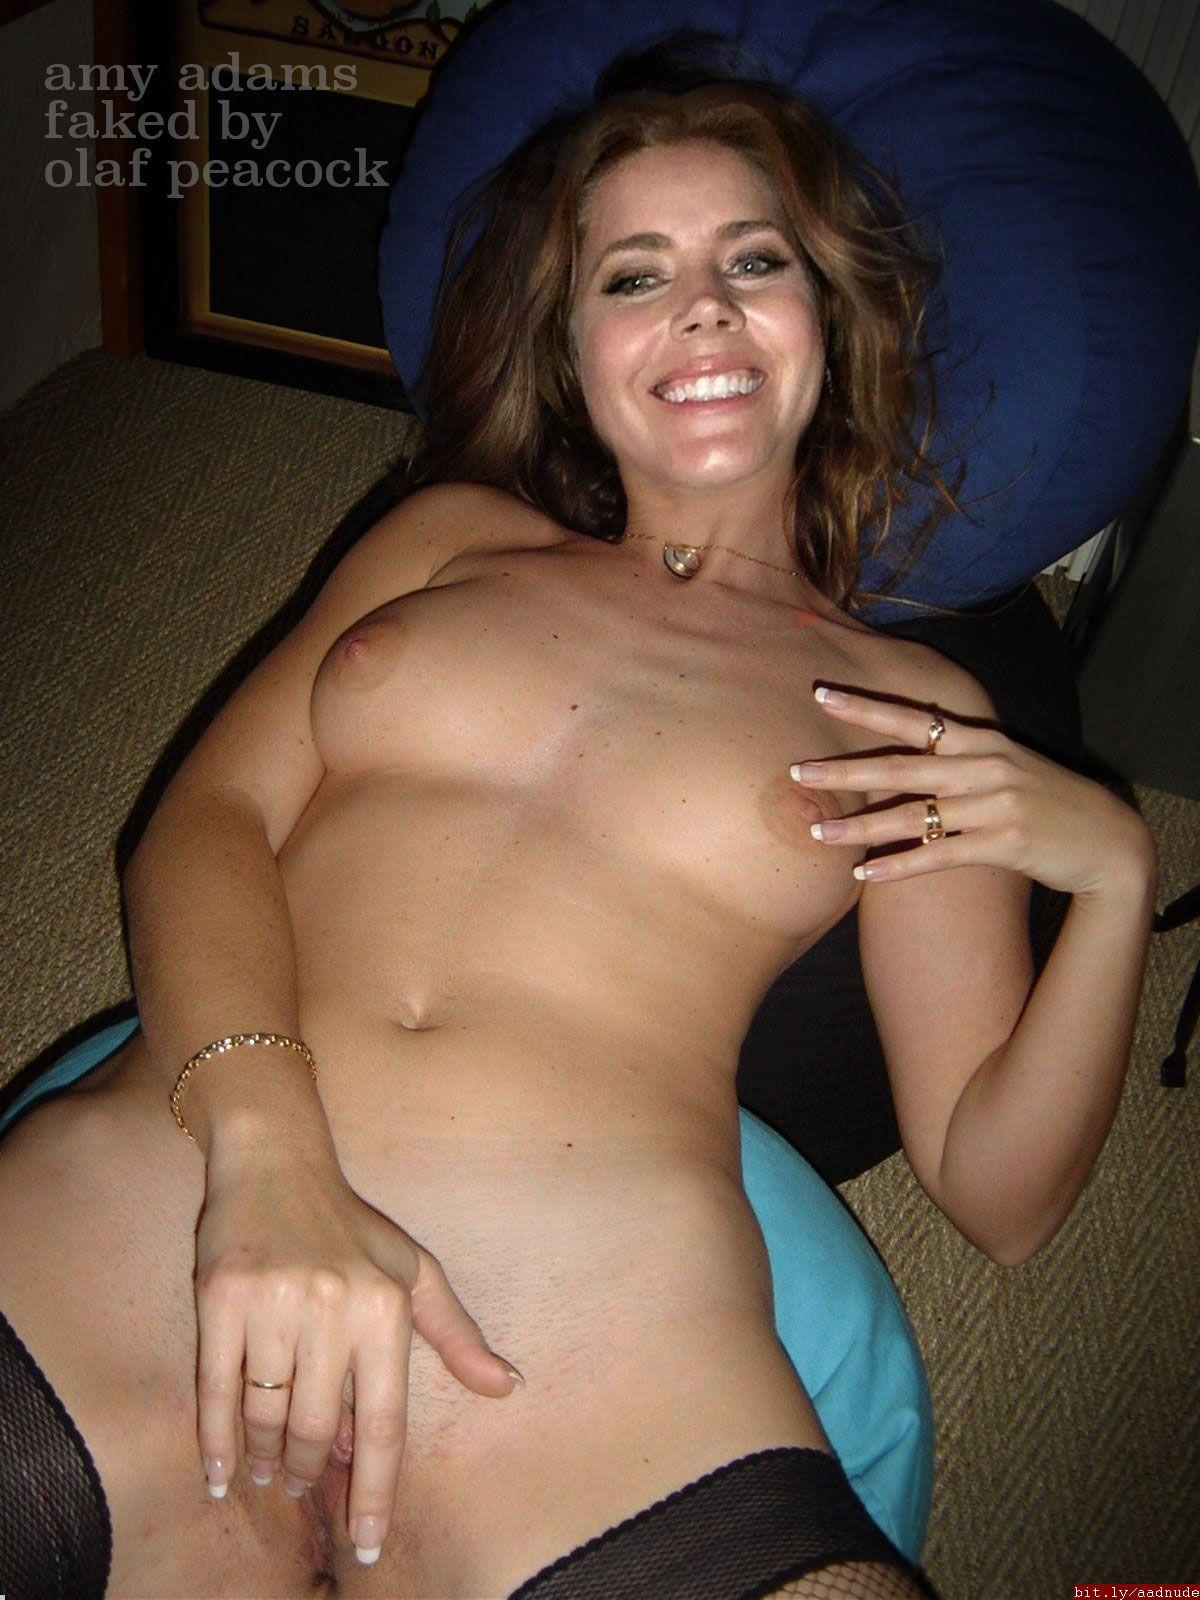 Amy adams nude fake